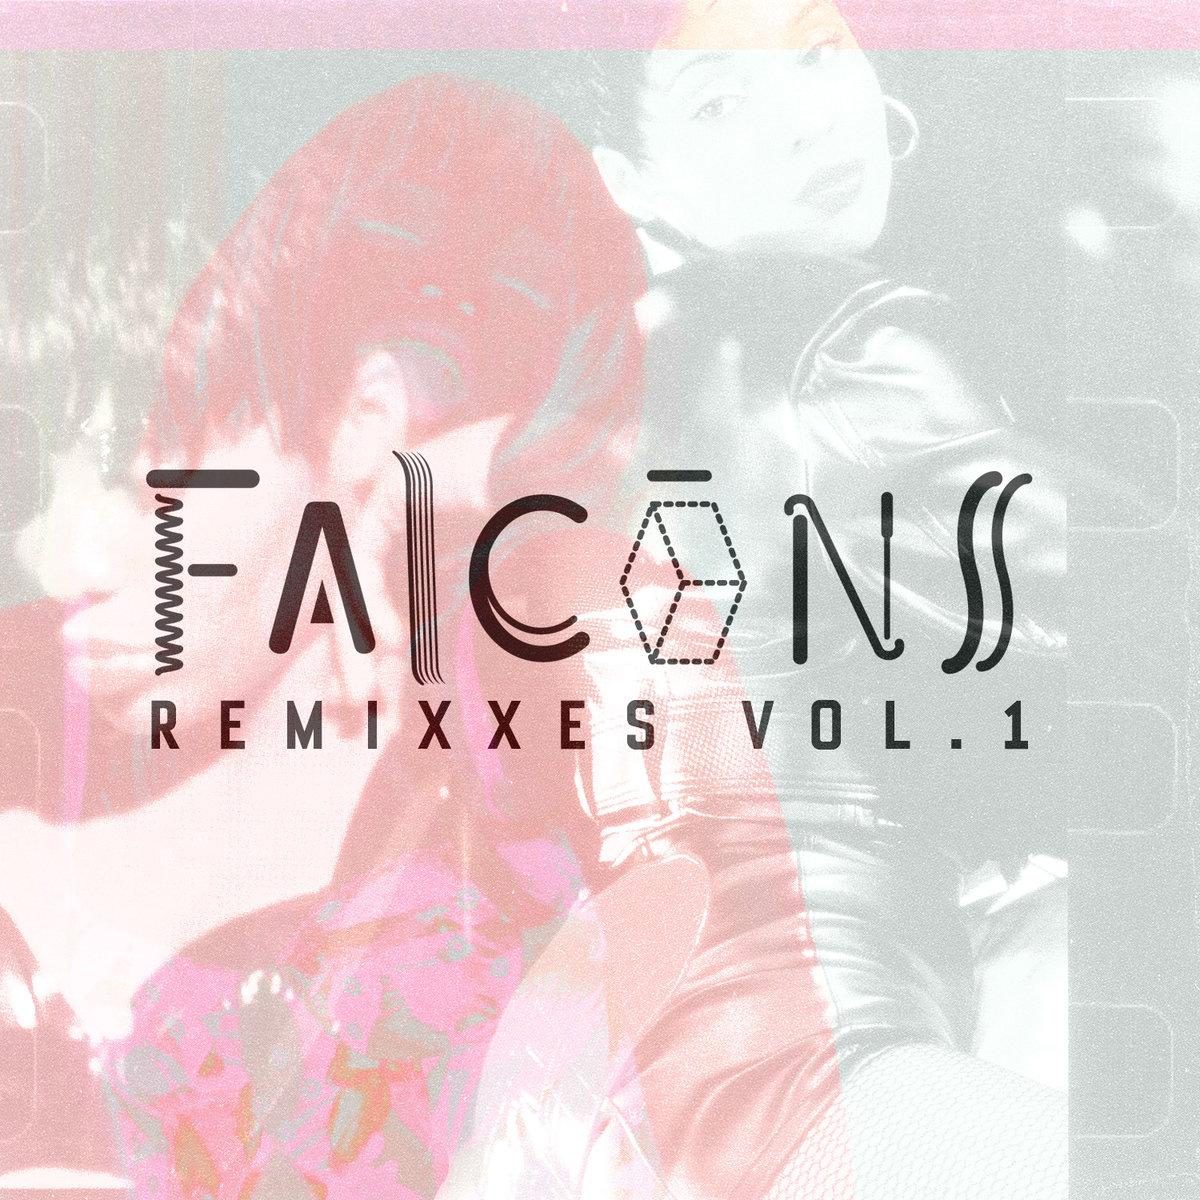 Remixxes Vol 1